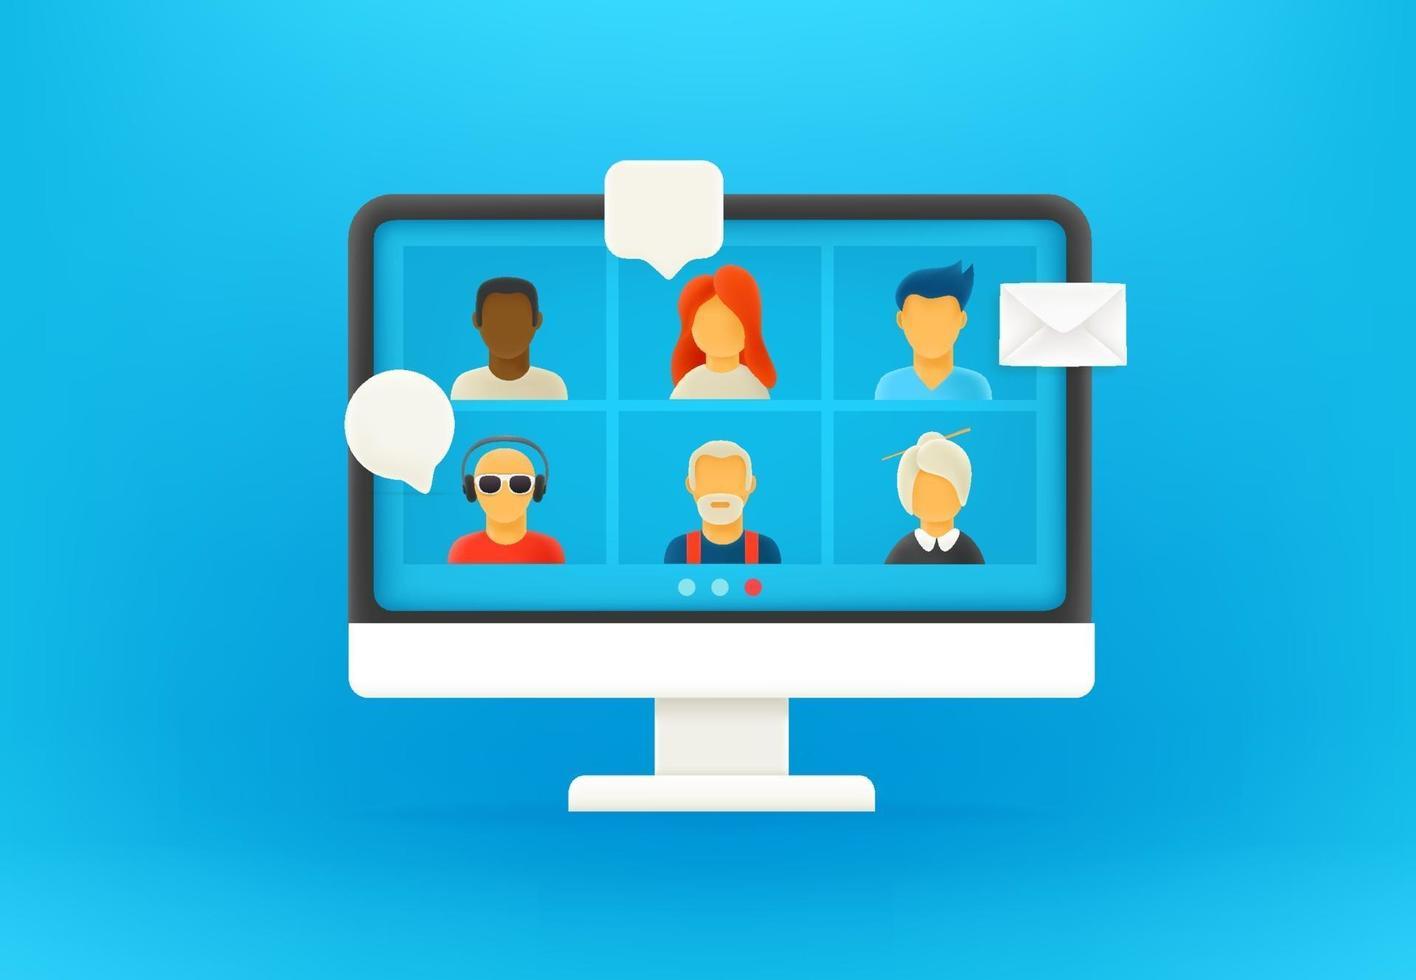 Conference via internet in coronavirus. 3d style  vector illustration